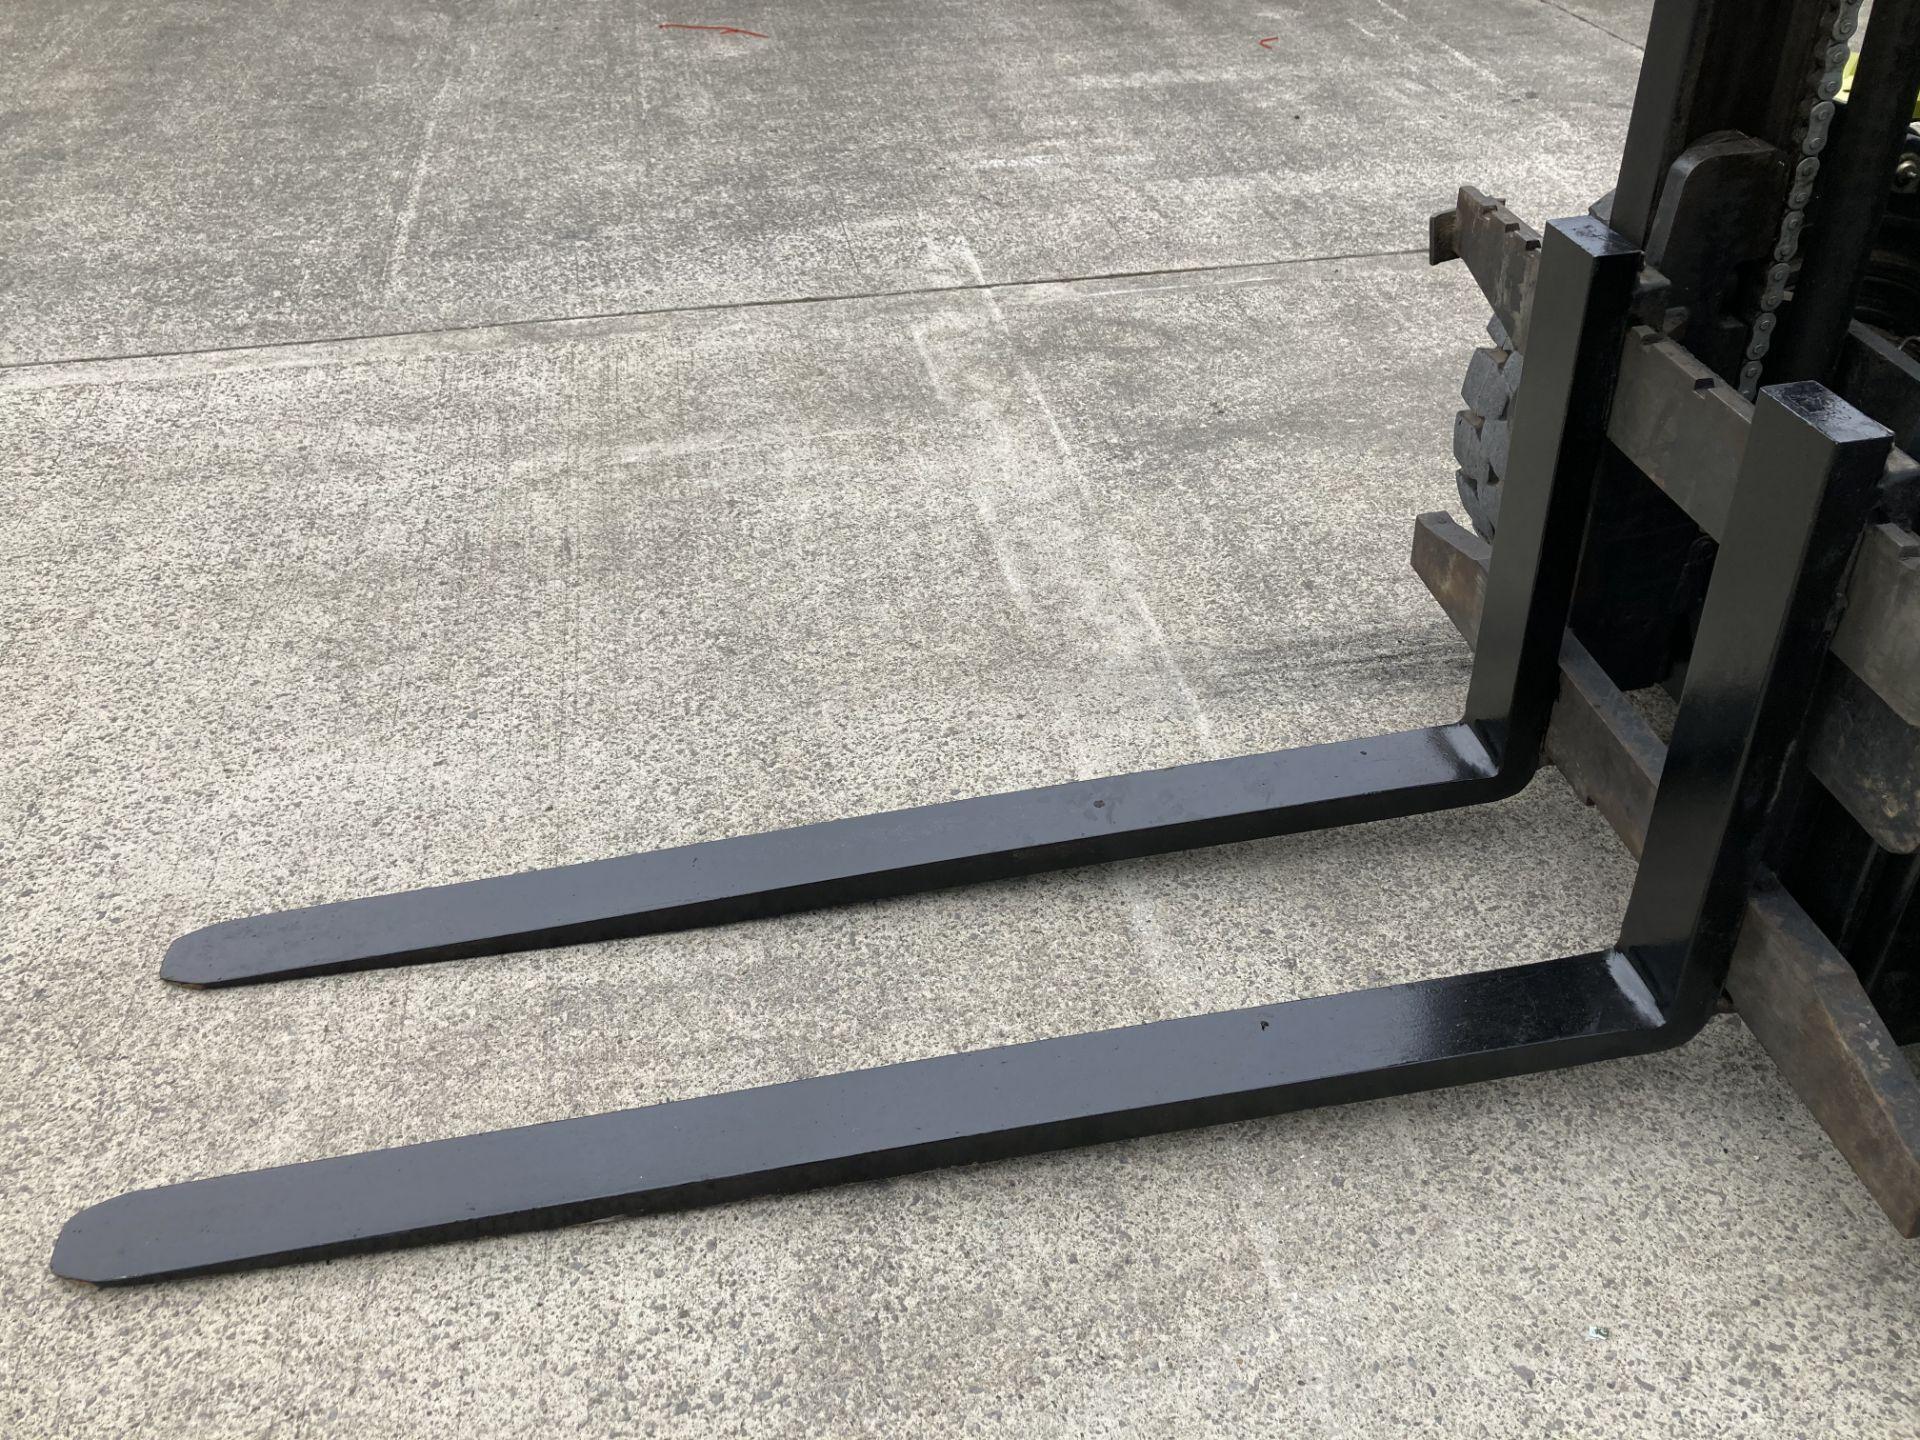 CLARK C30D DIESEL 3T FORKTRUCK Lift height: 3725mm Fork length: 1500mm YOM: 2012 Serial No: - Image 3 of 5